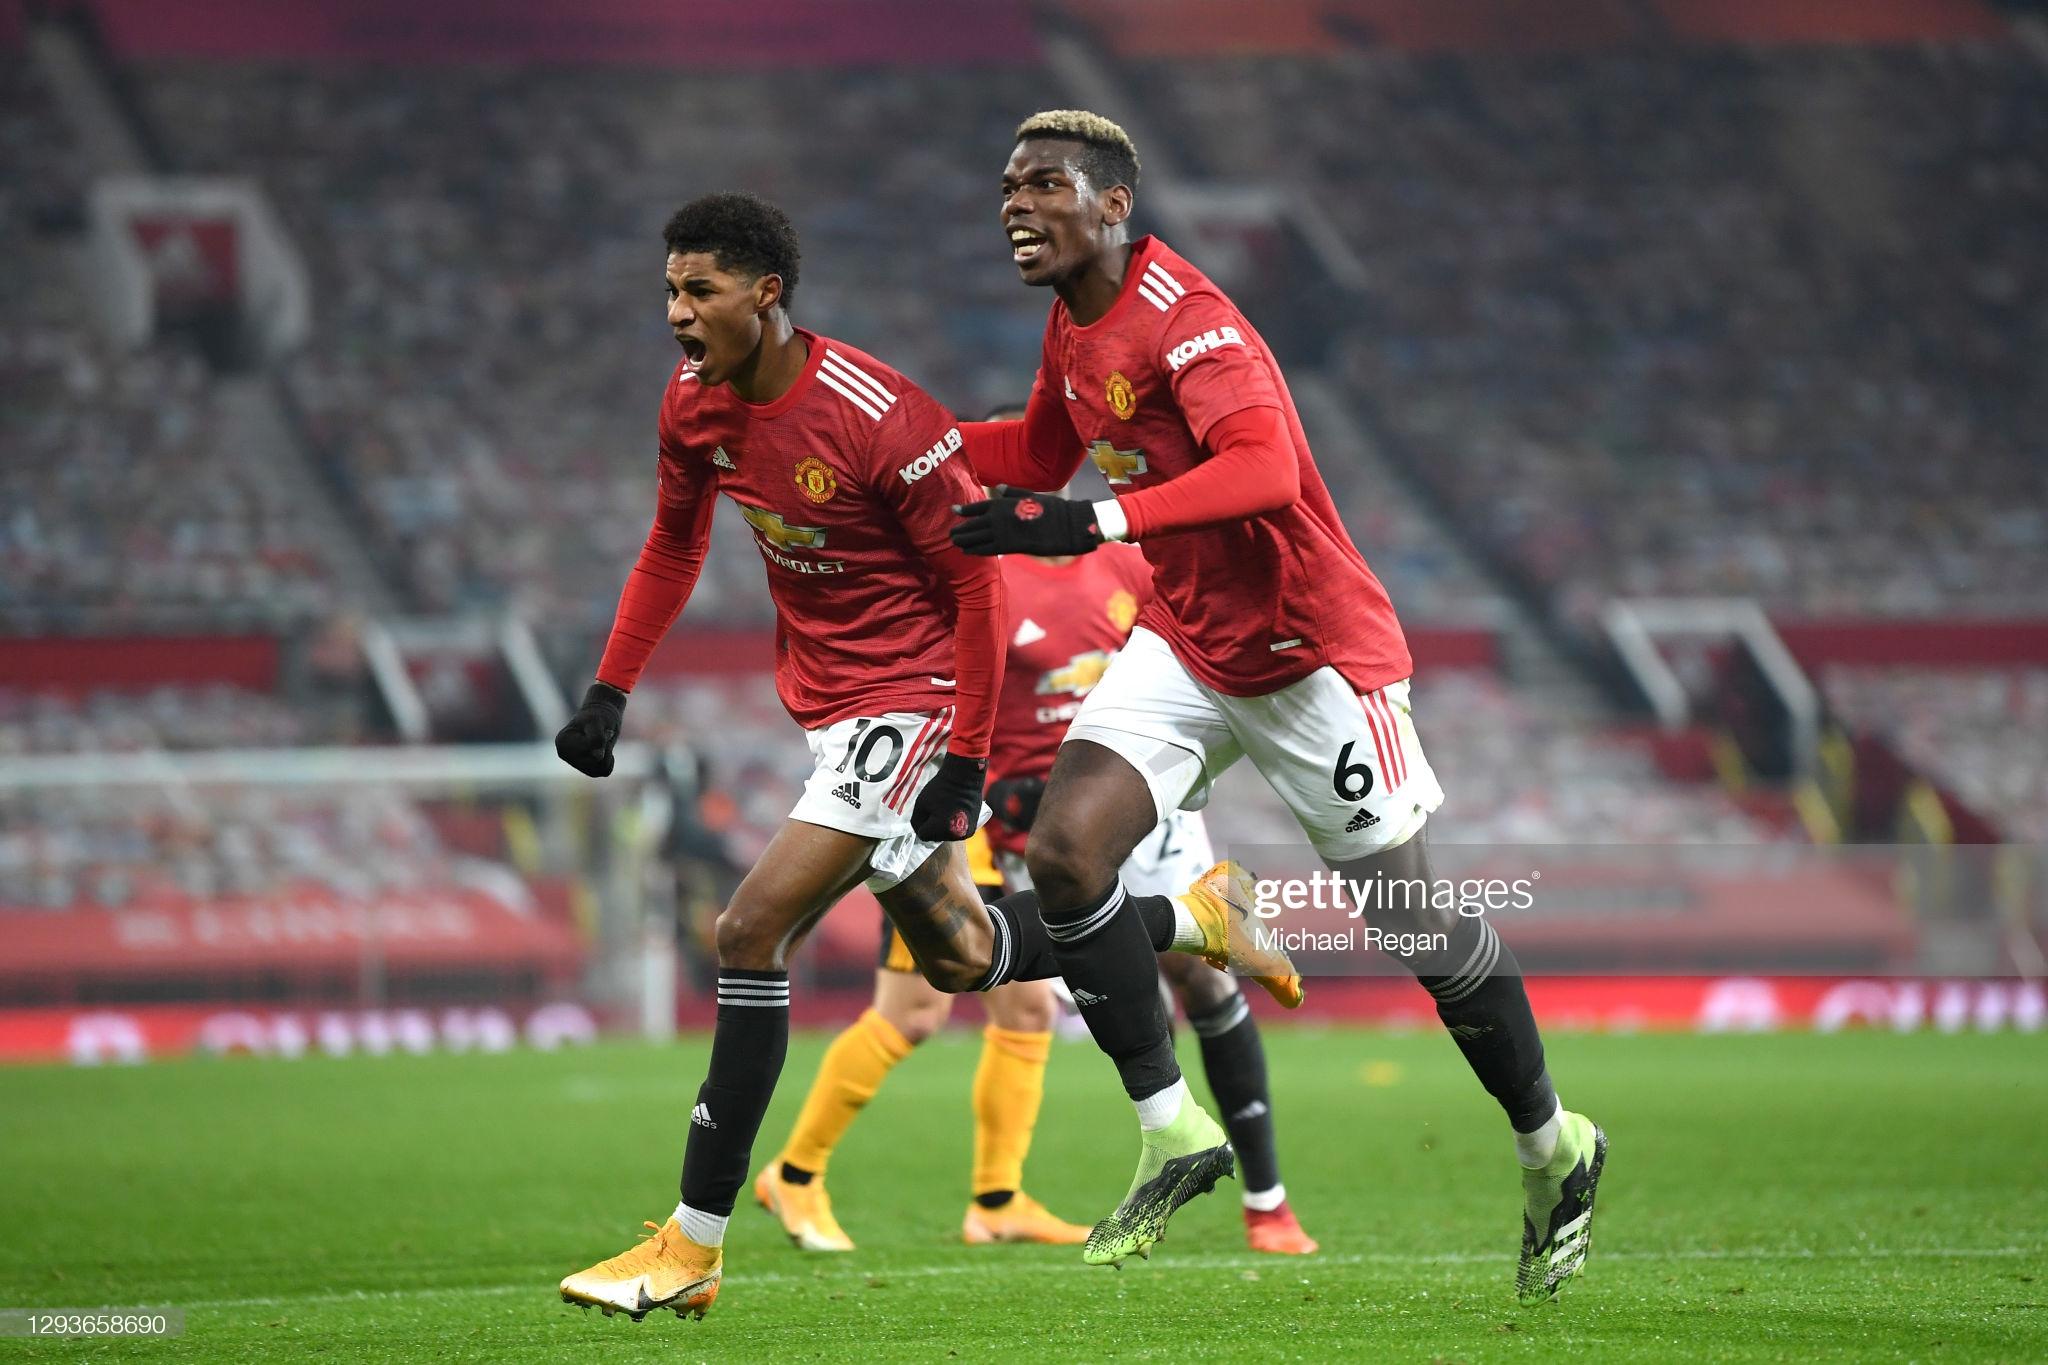 Manchester United: Marcus Rashford and Paul Pogba